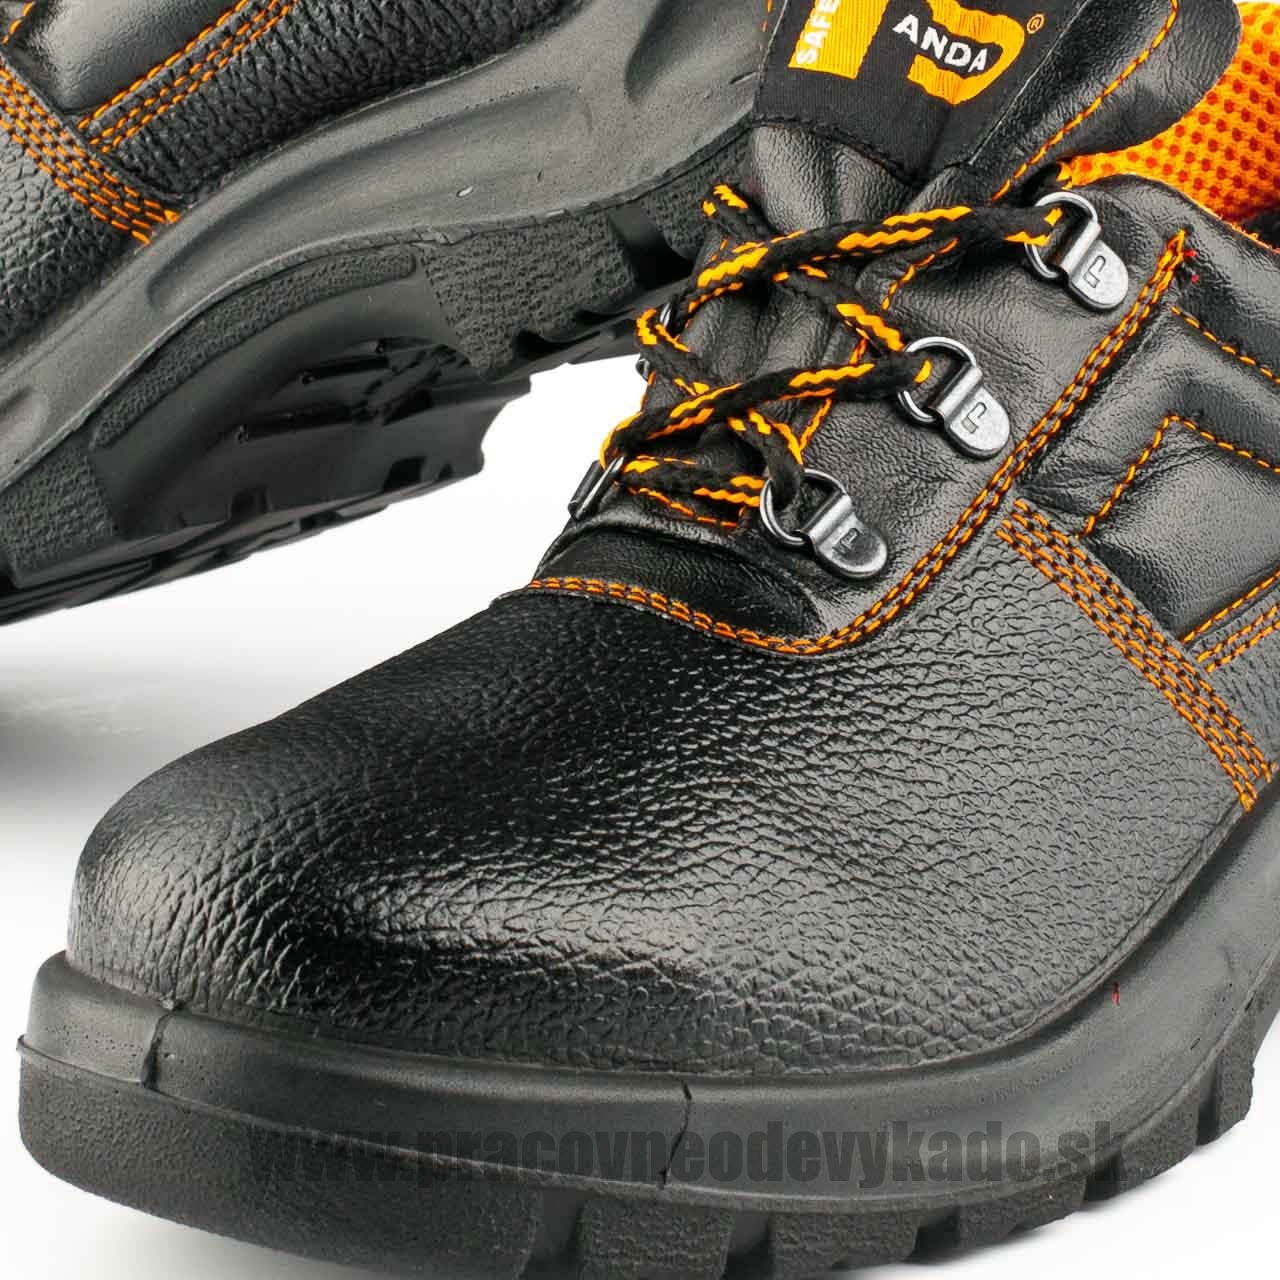 7ef21b2260349 Bezpečnostná obuv PANDA ERGON LOW BETA S1 6211